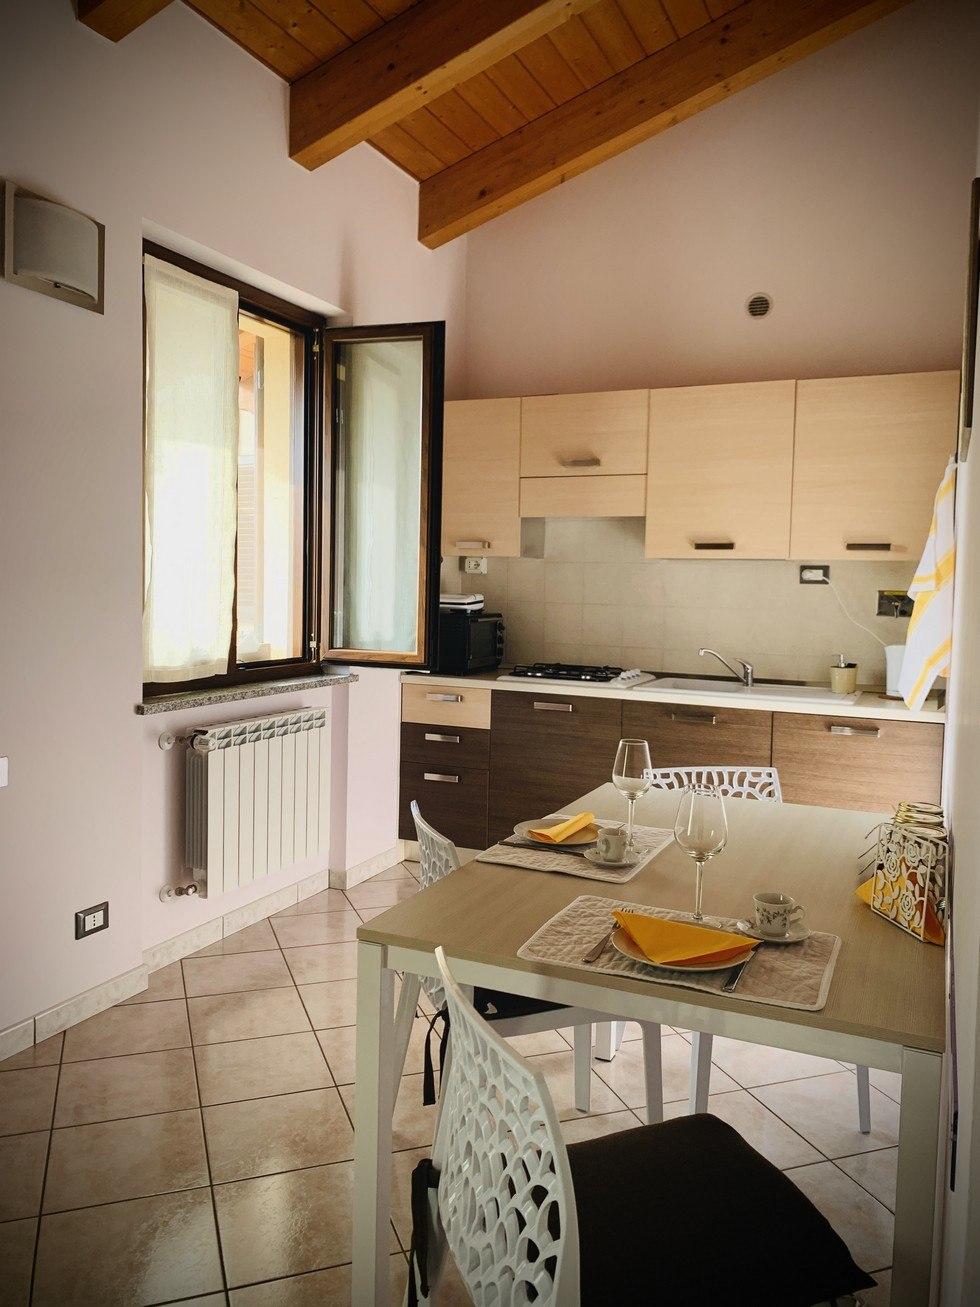 camera con cucina per vacanze alto piemonte